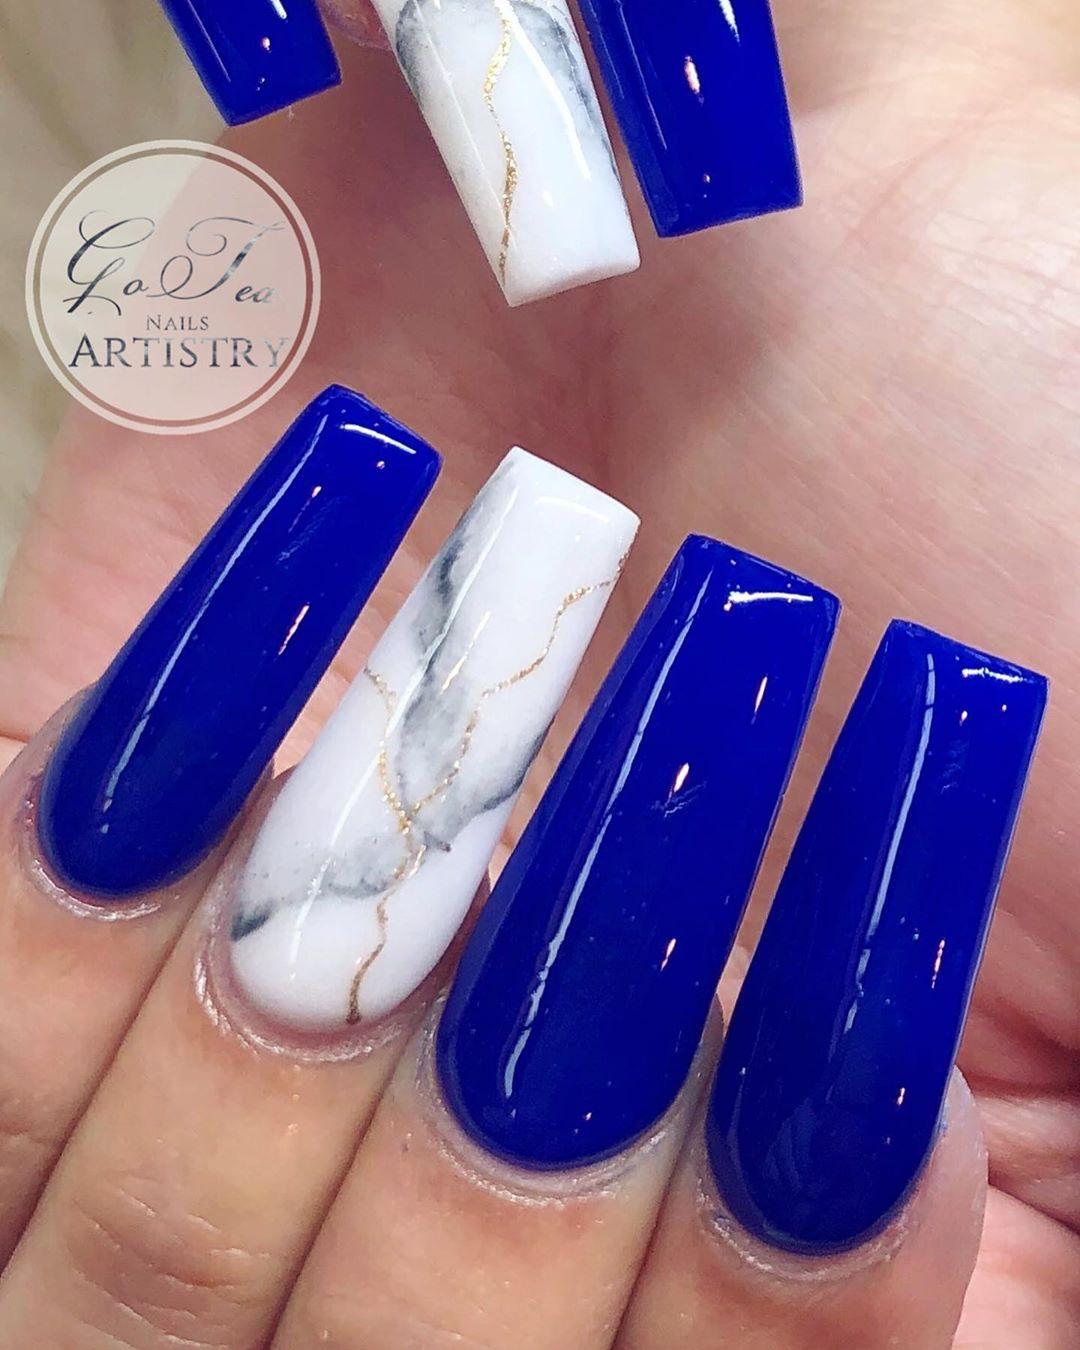 Royal Blue In 2020 Blue Acrylic Nails Fall Acrylic Nails Best Acrylic Nails